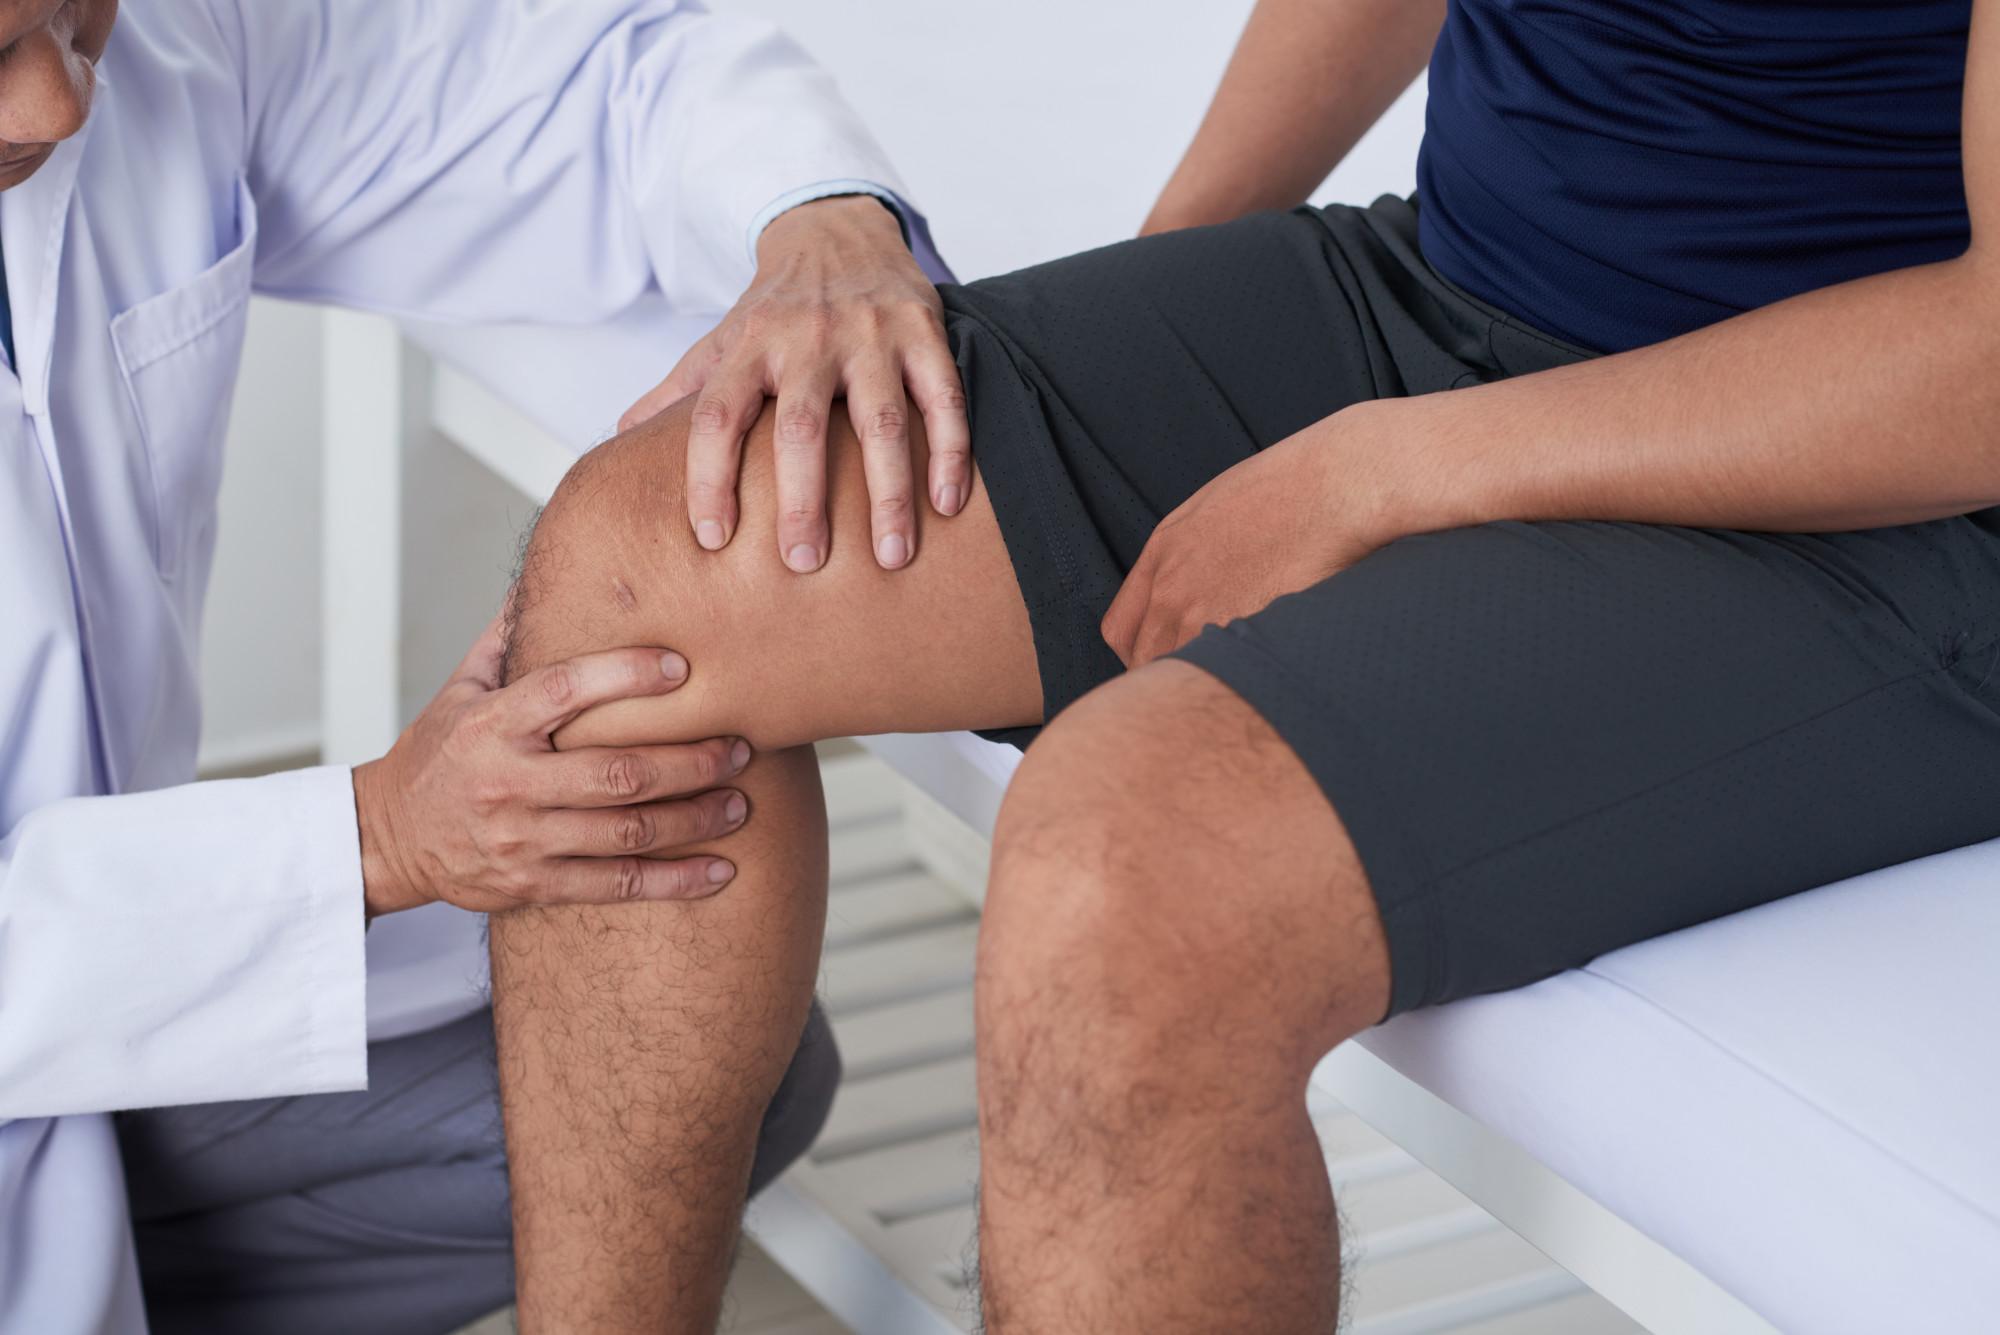 Orthopedic Surgeon Checking a Man's Knee